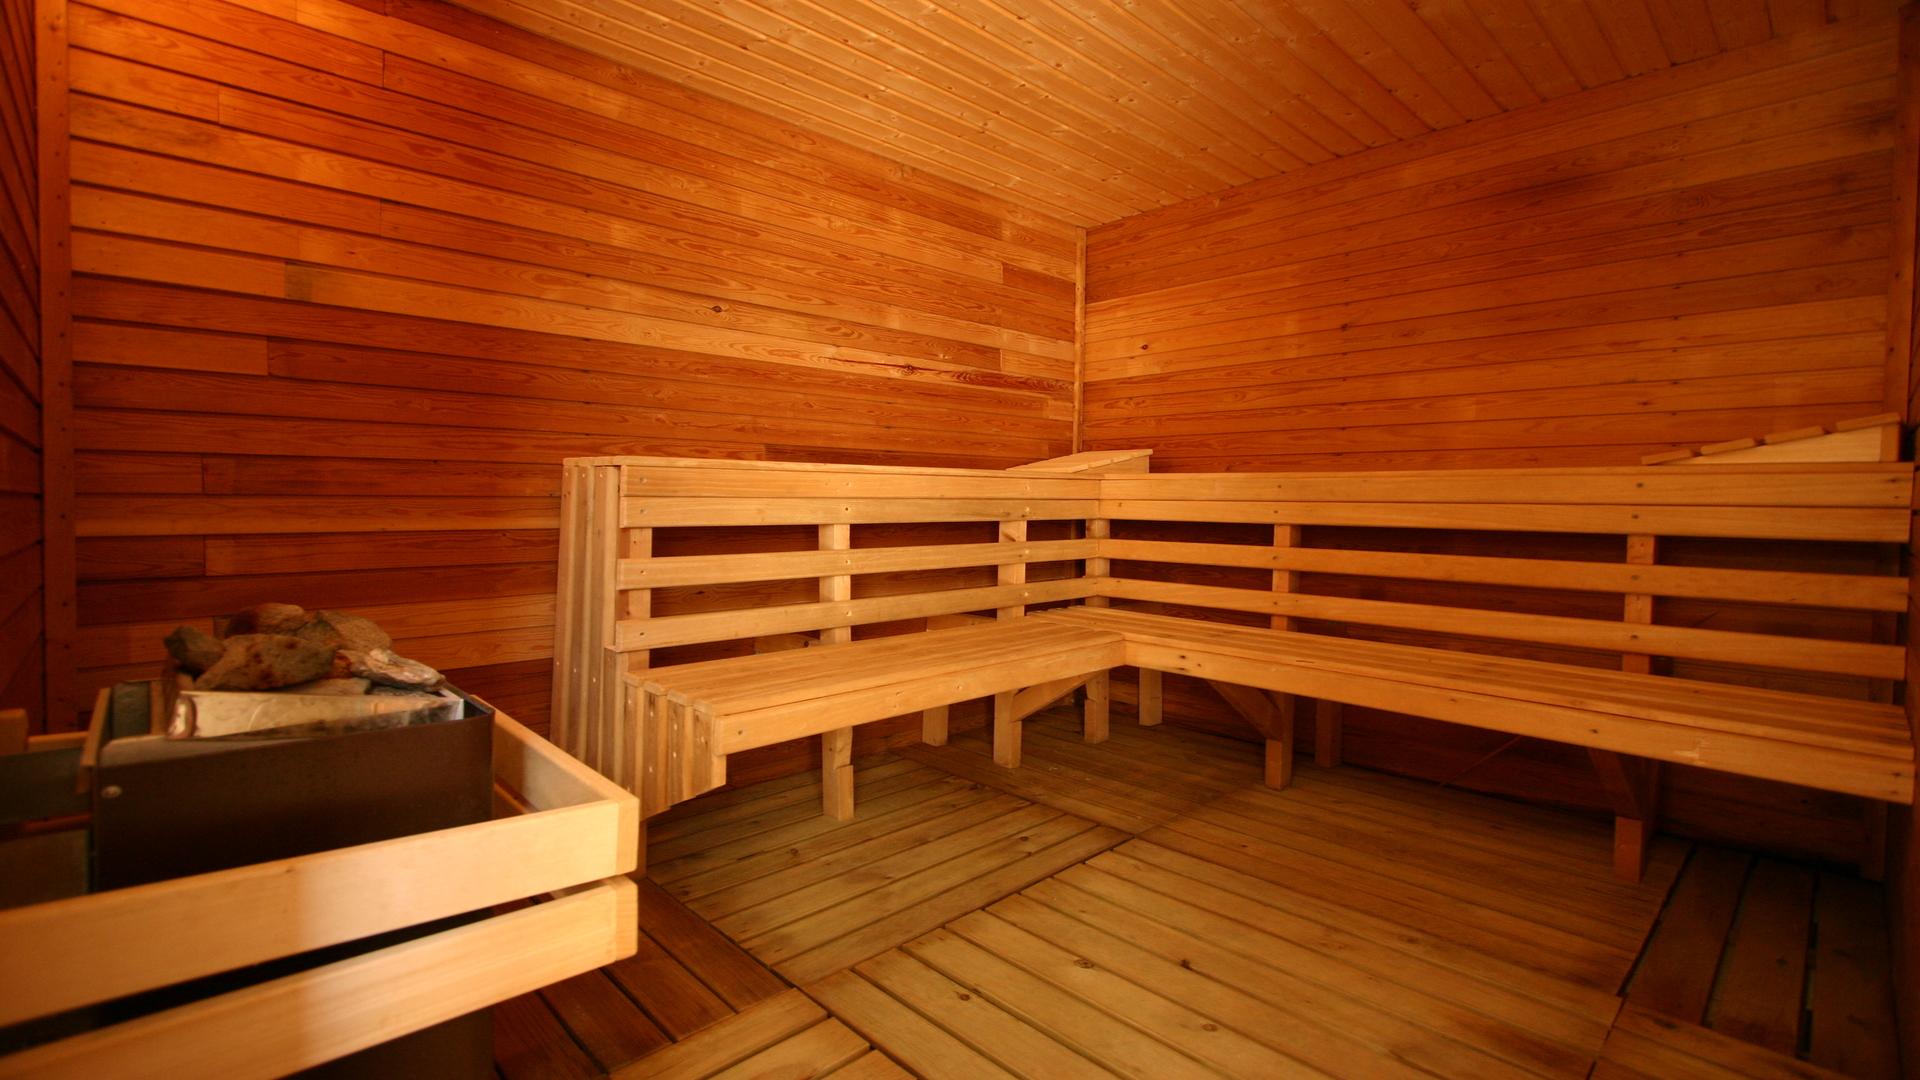 12 en sauna 9JPG.jpg